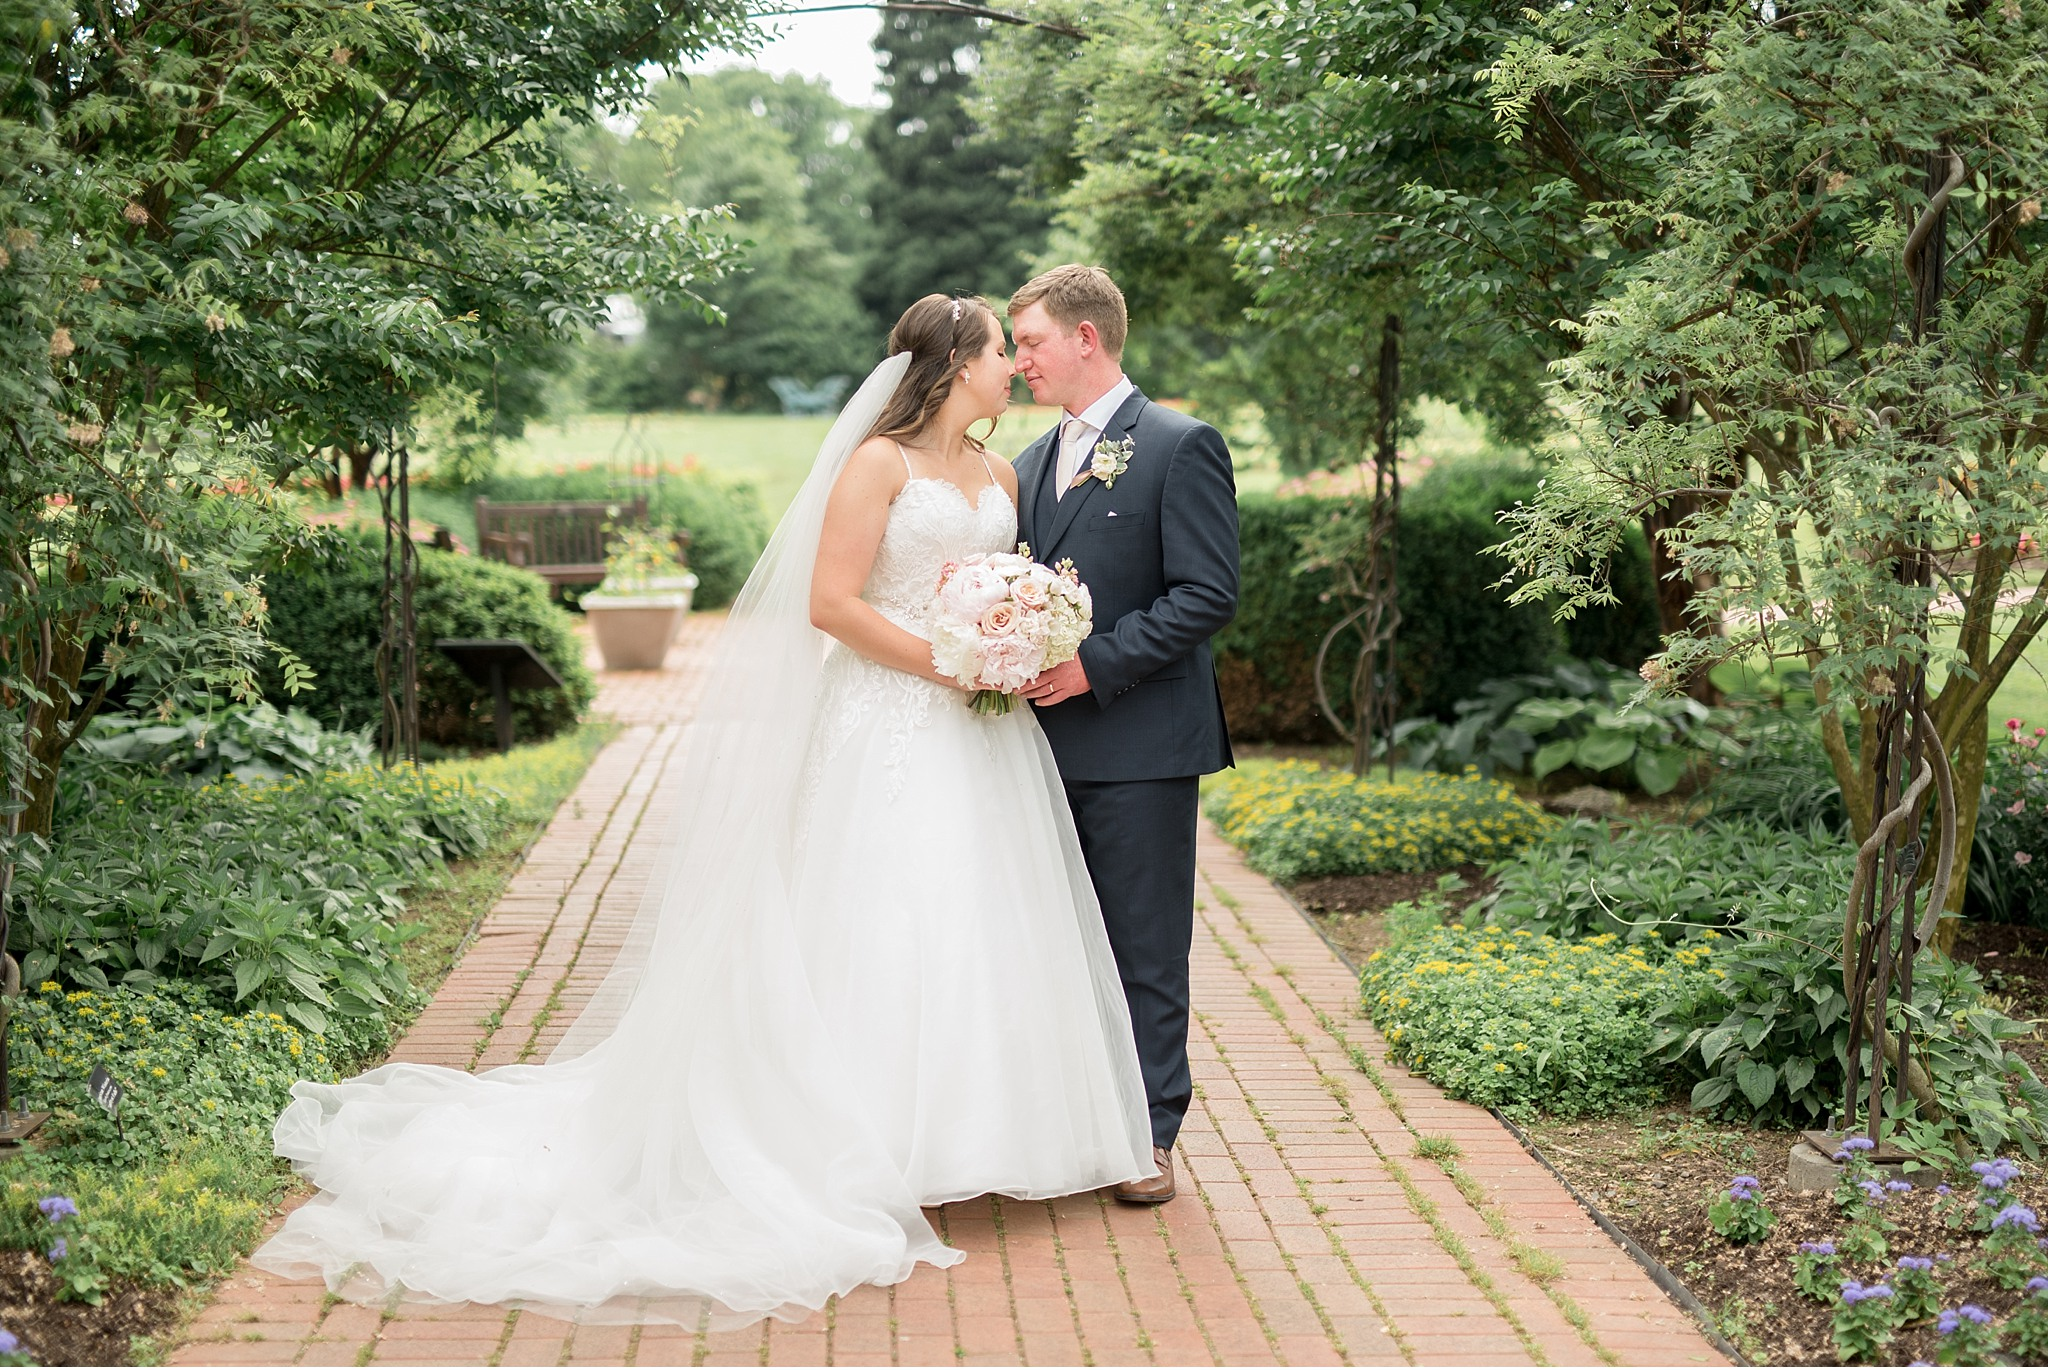 Hershey Gardens Hershey Country Club Summer beautiful wedding photography_1530.jpg